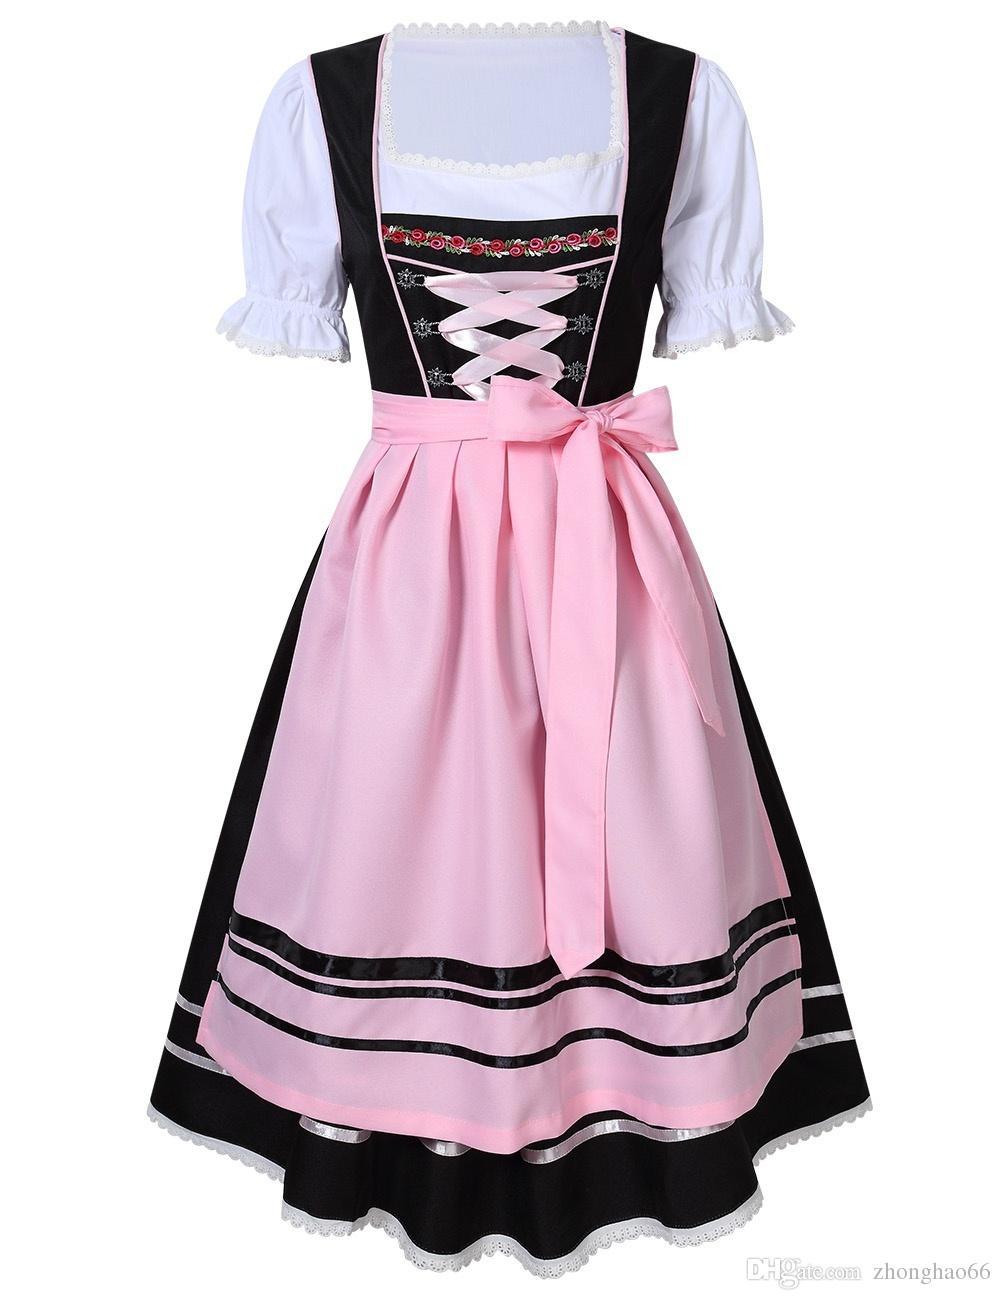 782189336fc New German Bavarian Oktoberfest Promotional Exhibition Dress Holiday Party  Dresses Women s German Dirndl Dress Oktoberfest Costumes Oktoberfest Dress  ...